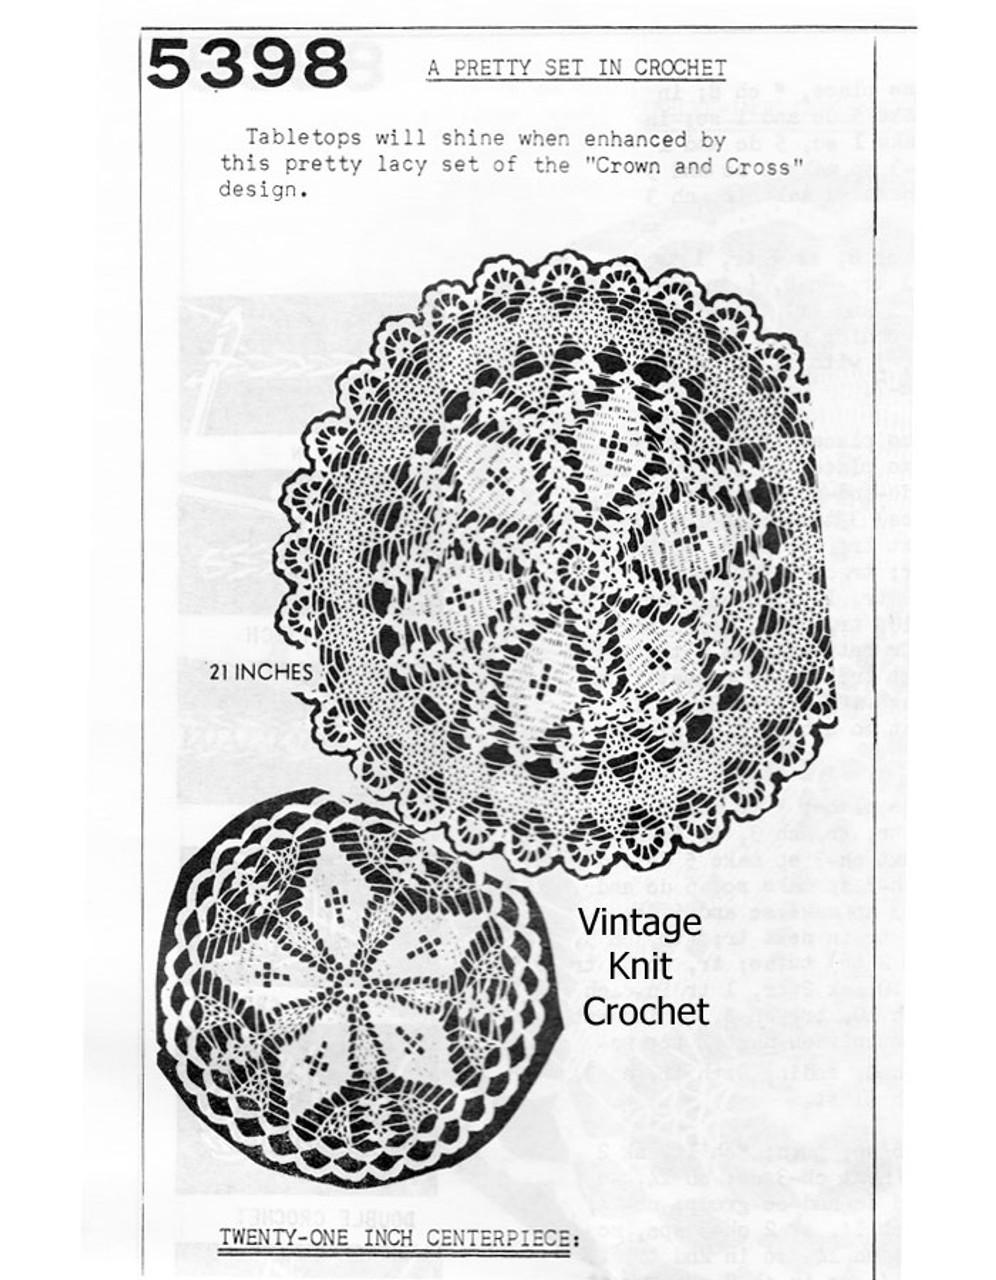 Vintage Centerpiece Crochet Doily Pattern, Cross & Crown No 5398